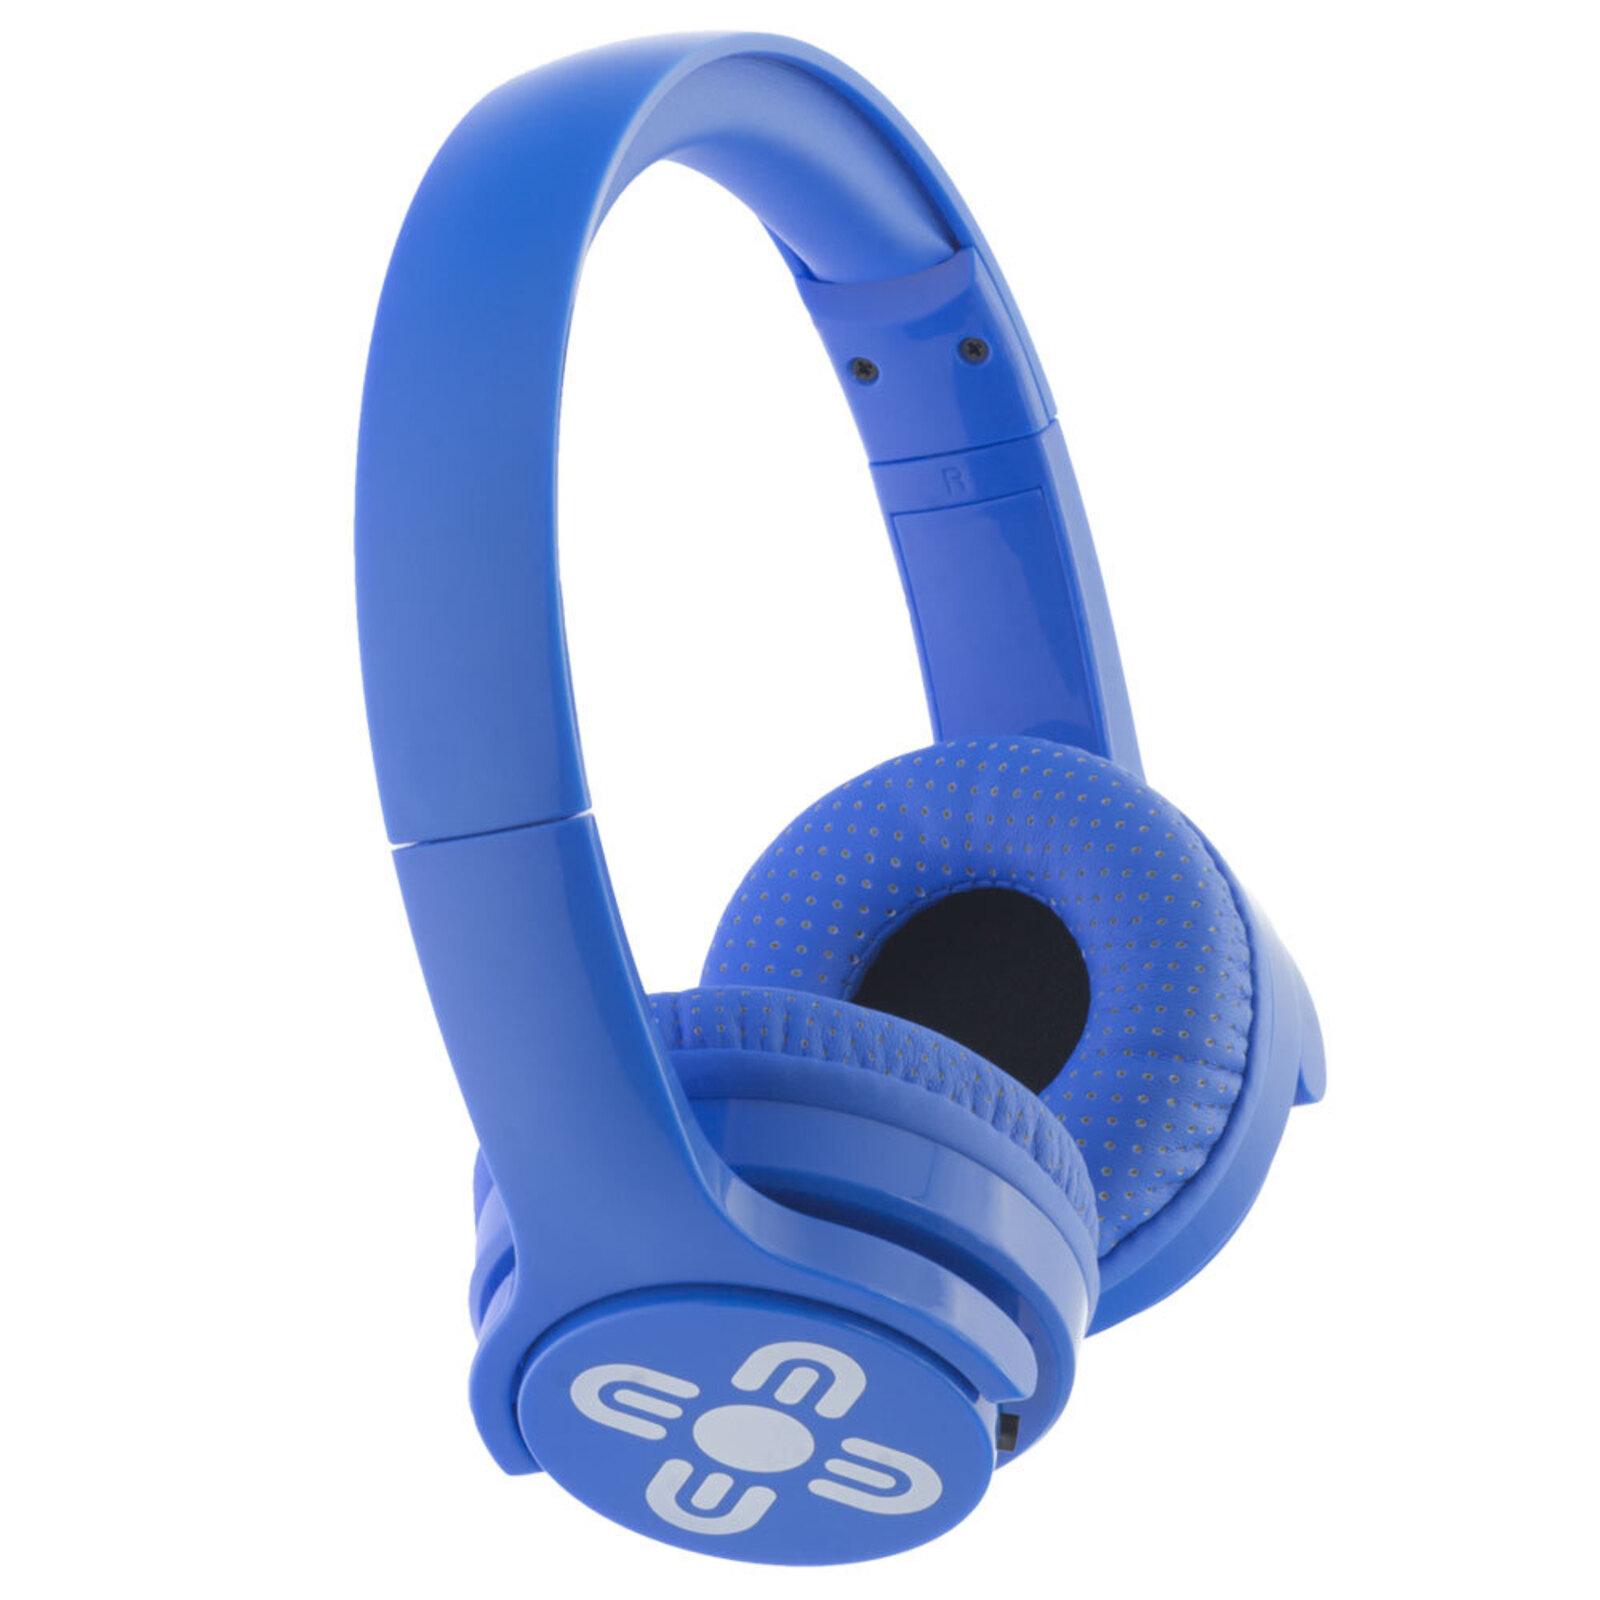 Moki Brites Wireless Bluetooth Adjustable Headphones Over-Ear Headset w/Mic/Blue